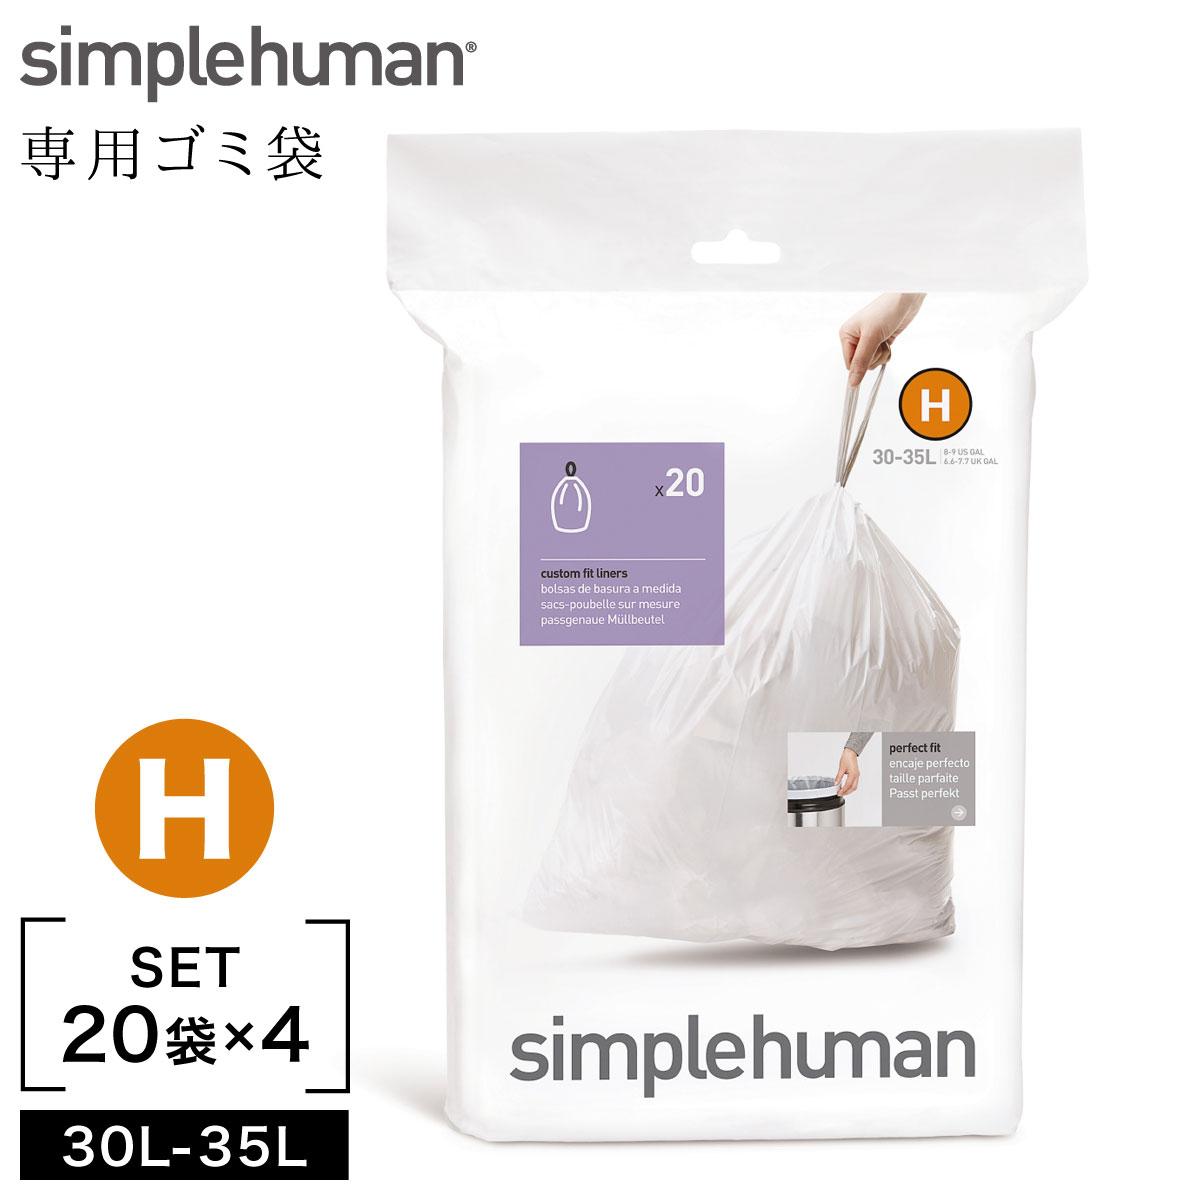 simplehuman シンプルヒューマン 専用ゴミ袋 カスタムフィットライナー H 00160 4Pセット メーカー直送 返品不可